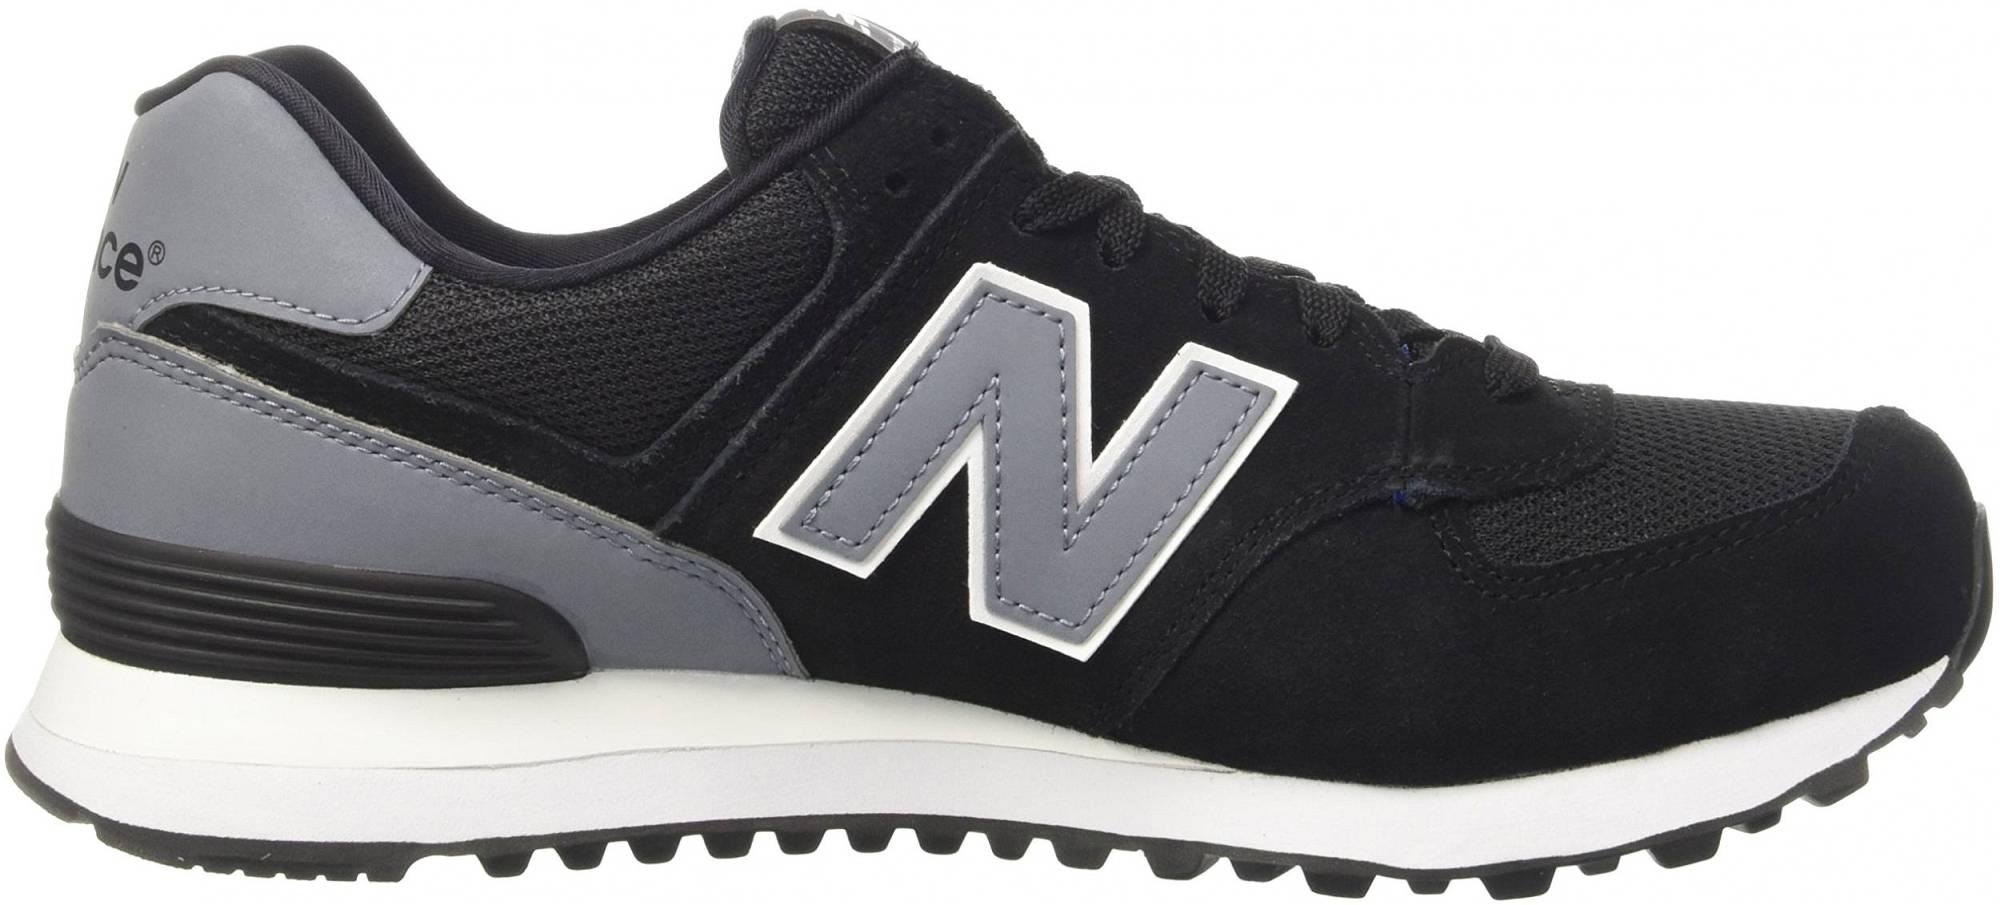 New Balance 574 Reflective – Shoes Reviews & Reasons To Buy